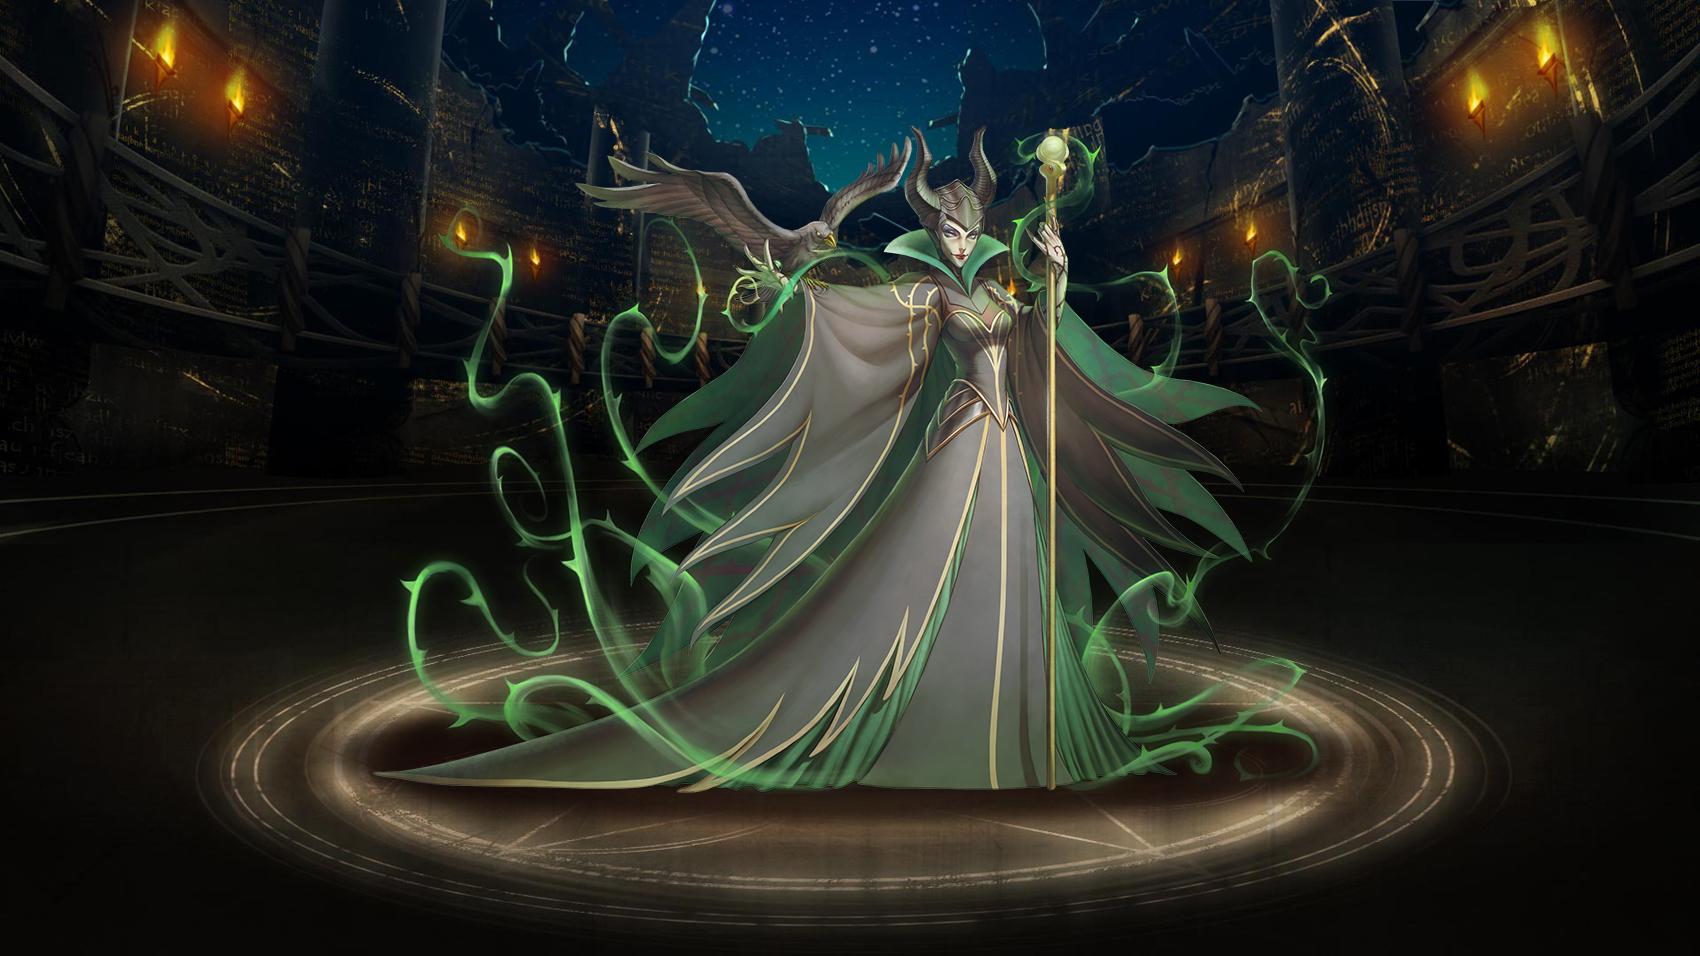 Maleficent the Evil Mistress - Tower of Saviors Wiki